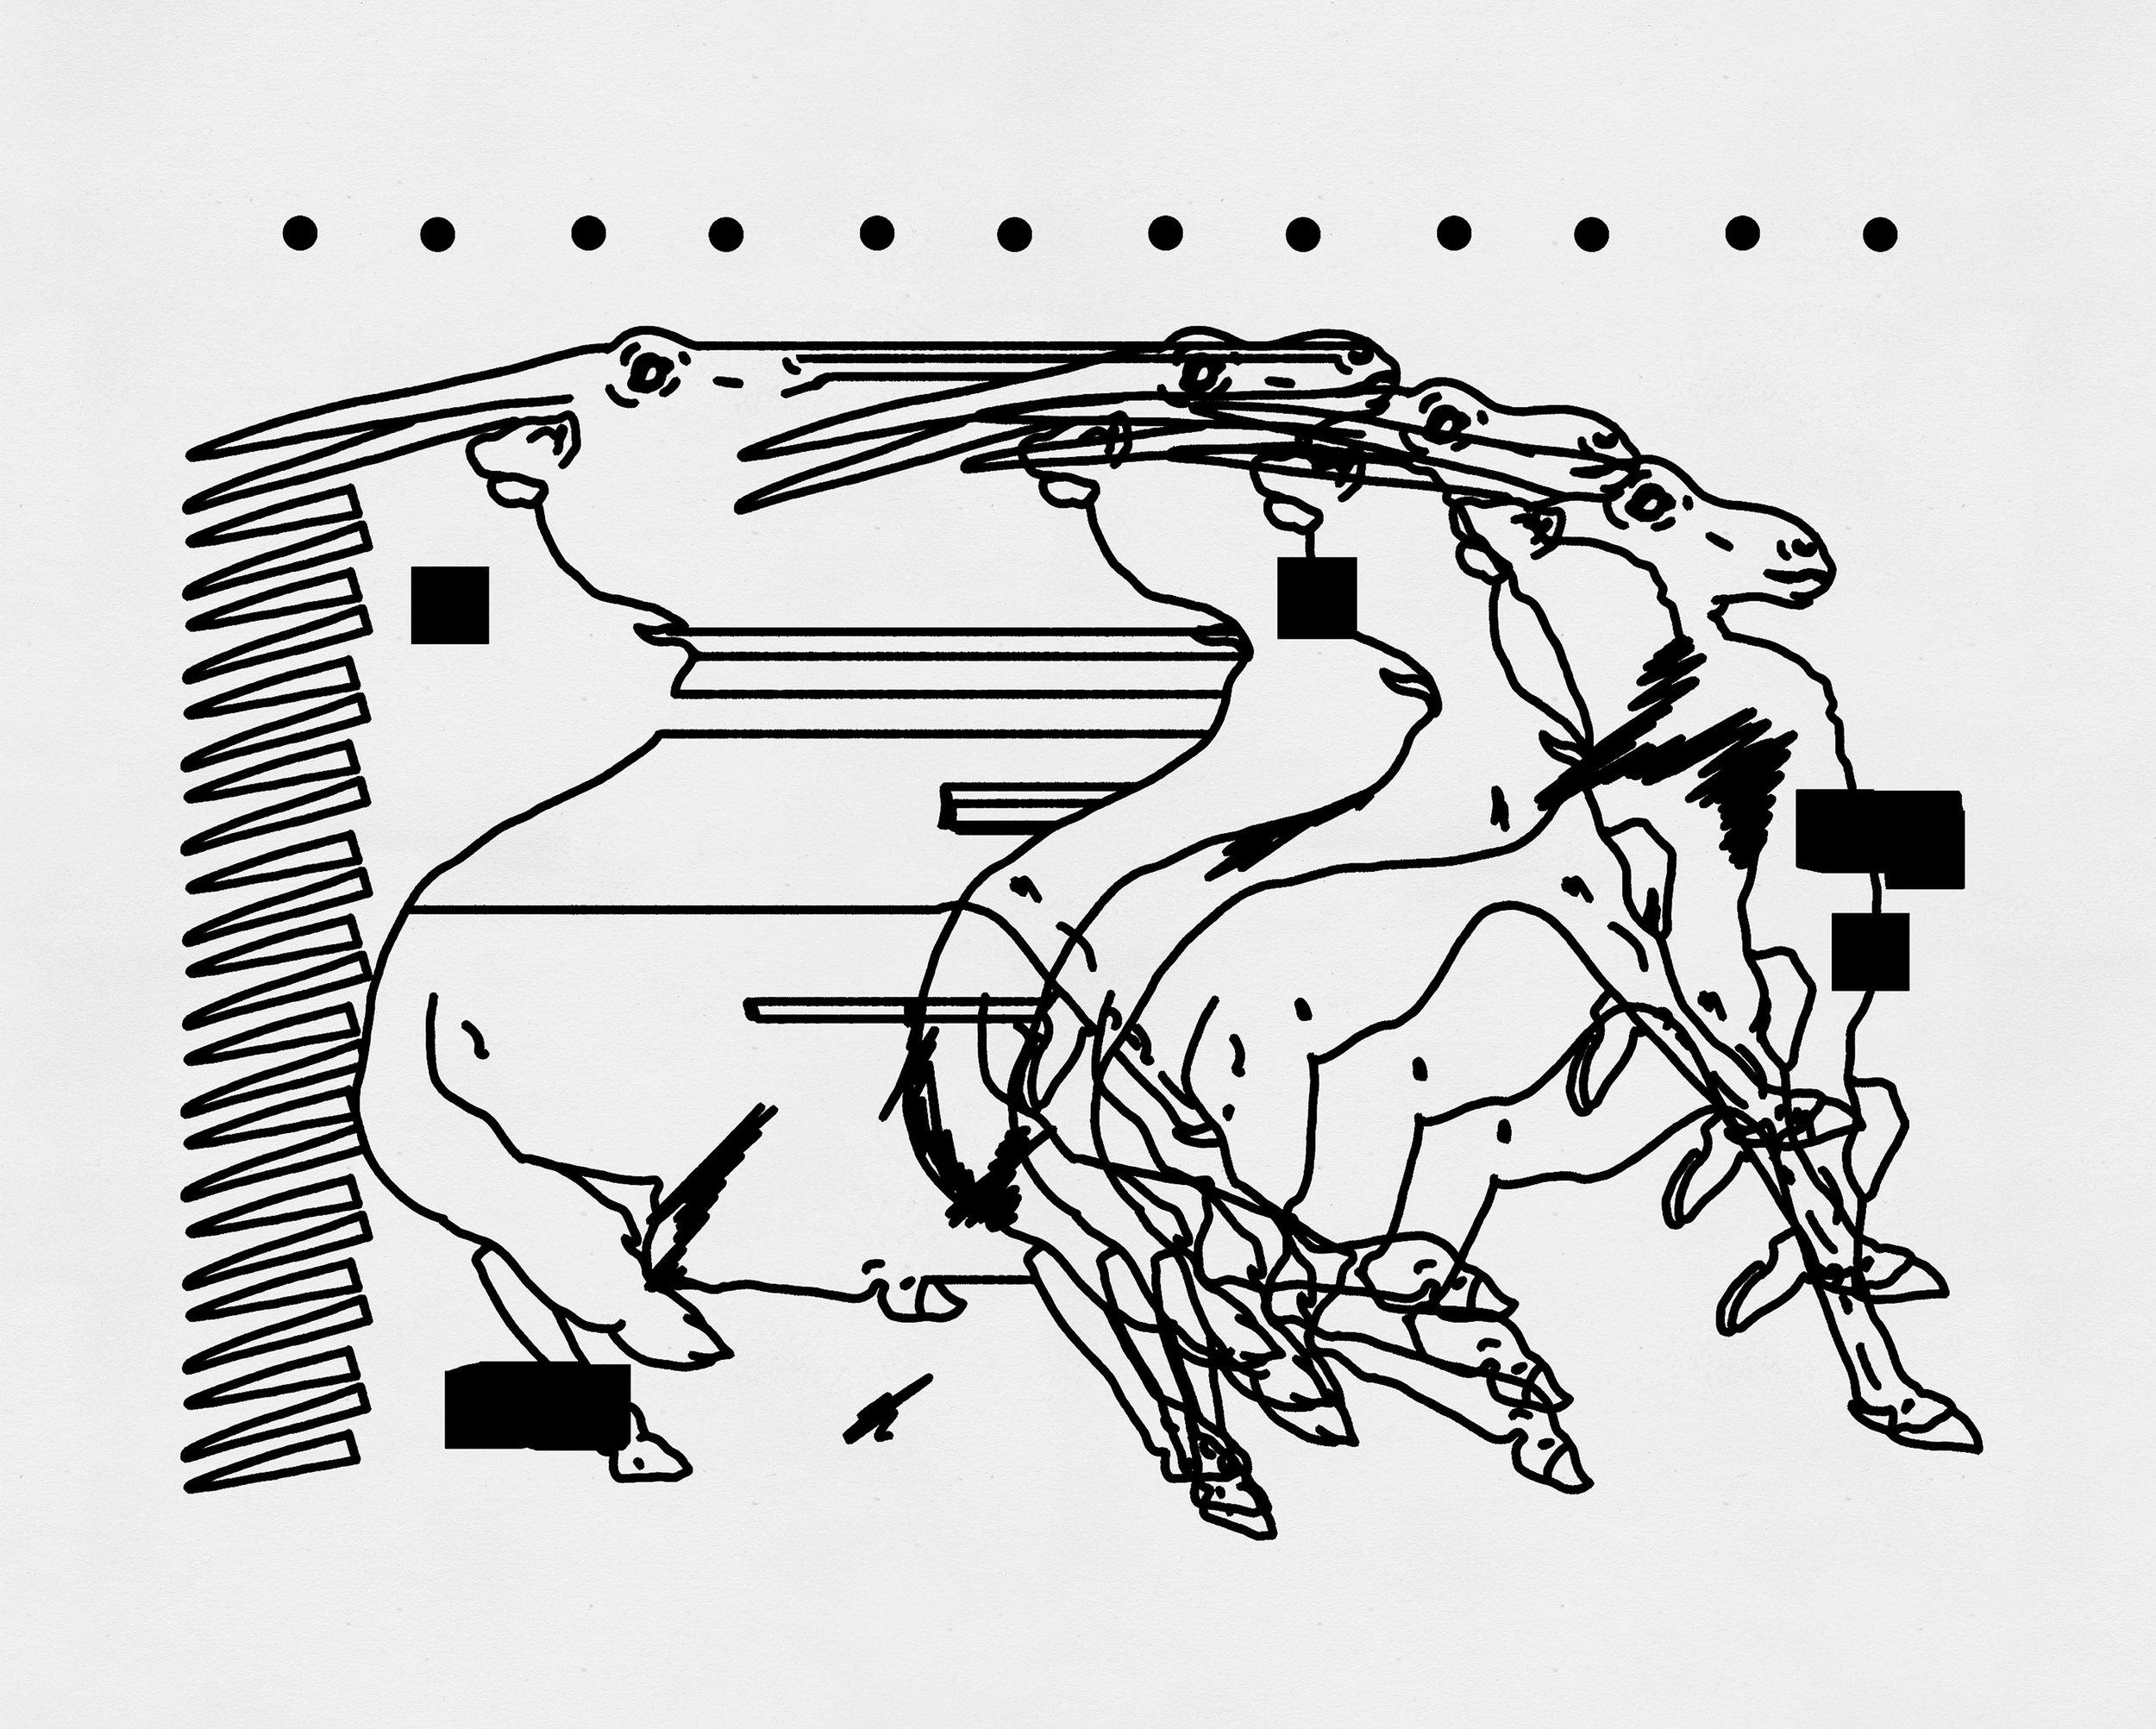 %22Tiranía donde no se debe%22 - 25 x 20 cm - Fine art print sobre papel - Julián Brangold - 2018.jpg